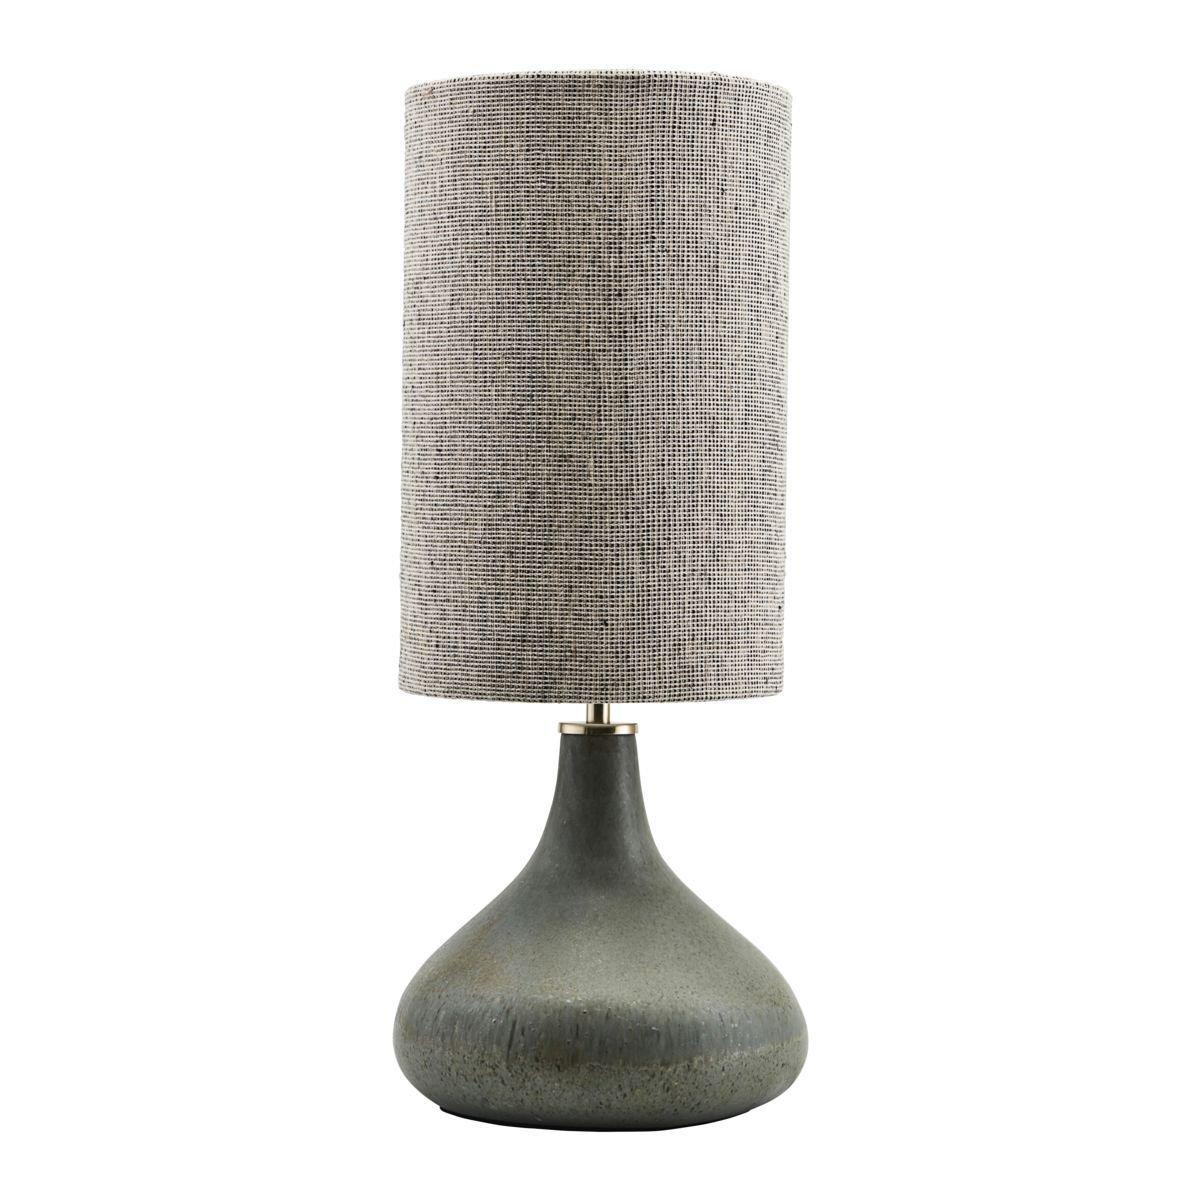 image-STOWE TABLE LAMP - SAGE